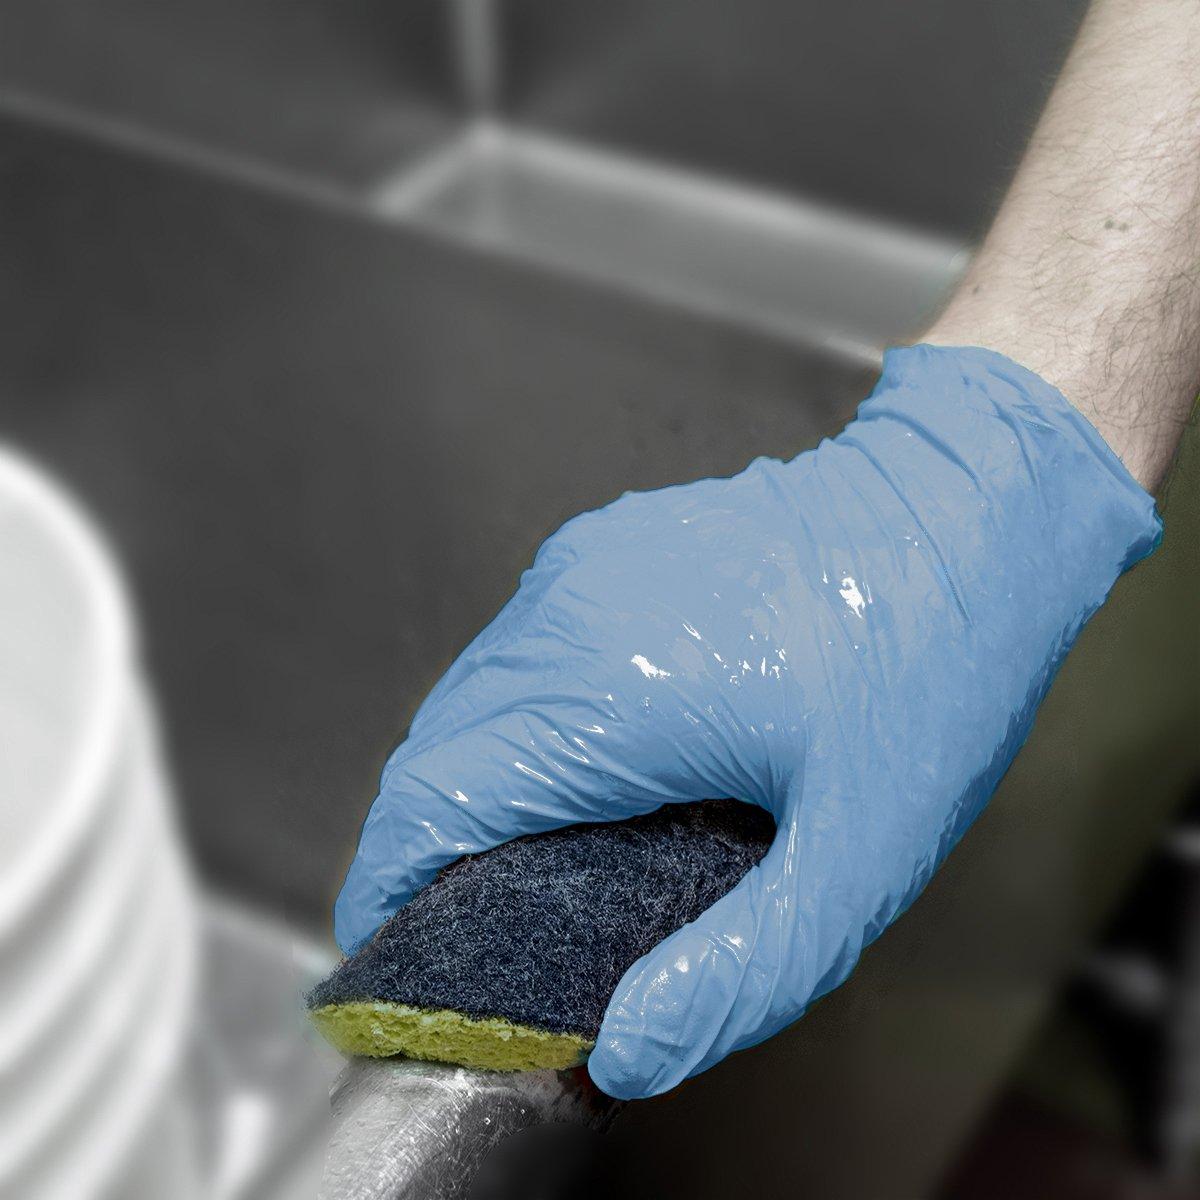 Powder Free UltraSource Economy Disposable Nitrile Gloves Dark Blue Large Box of 150 5 mil 441260-L